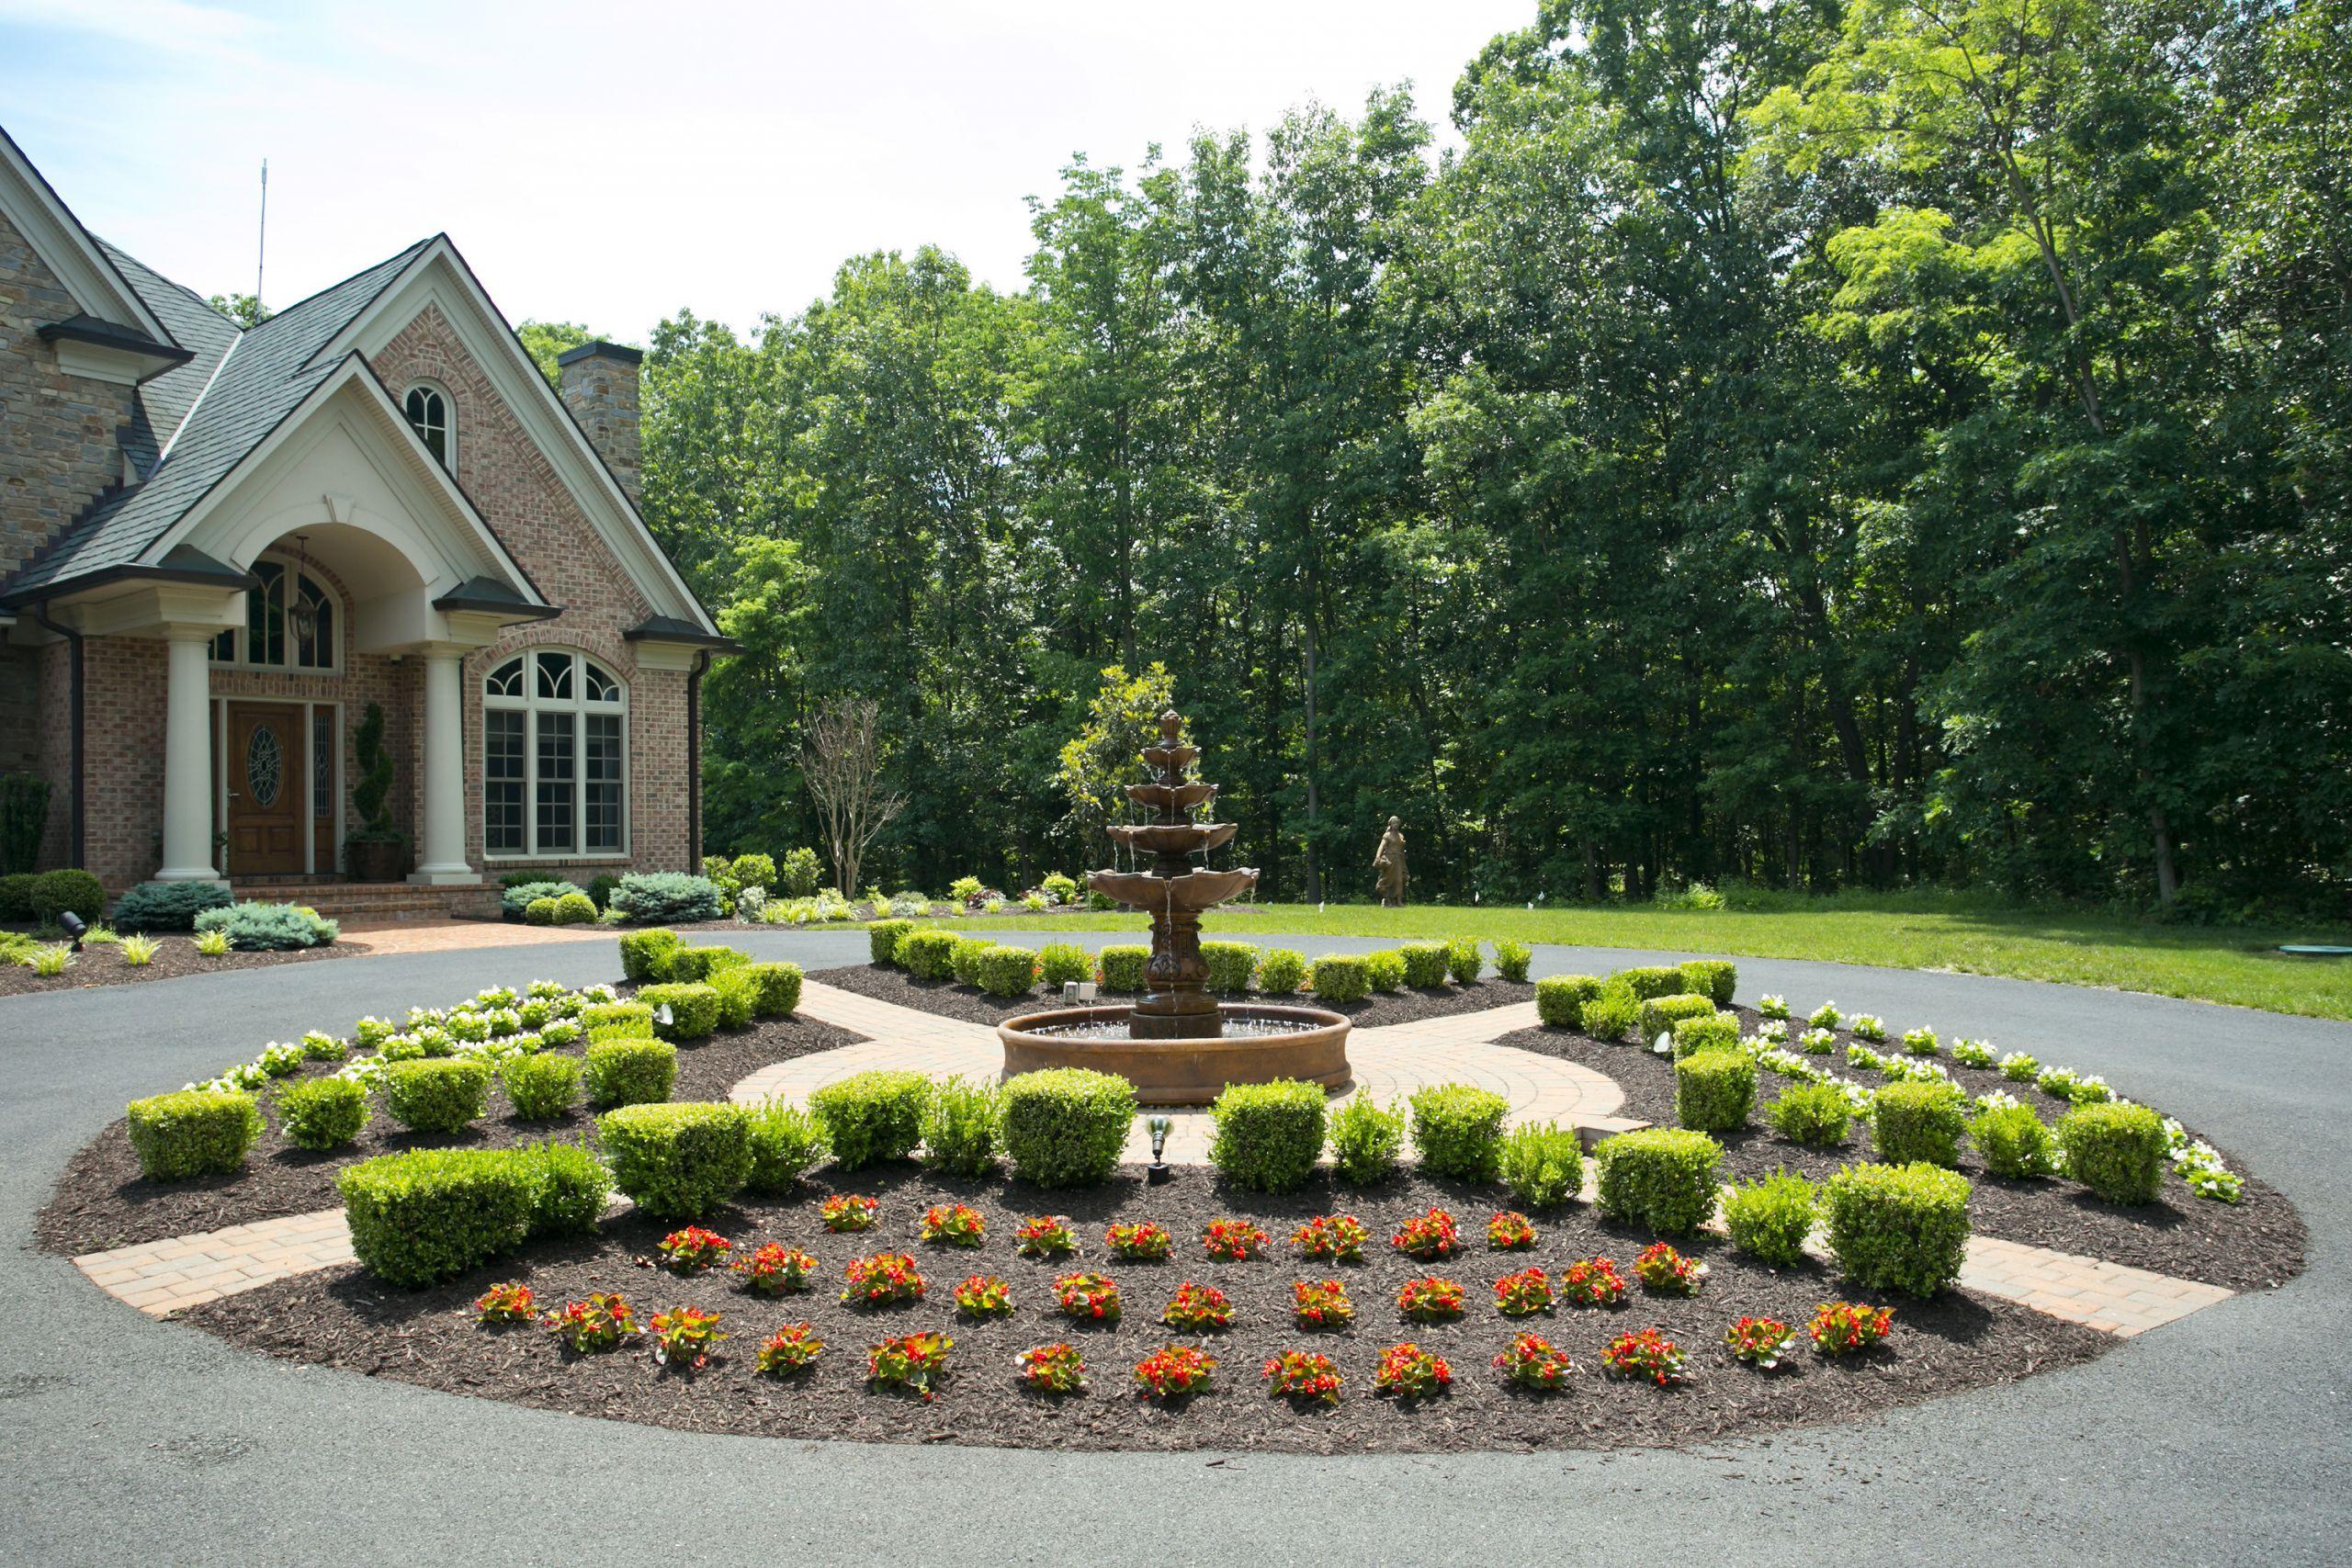 Residential Landscape Design  Residential Landscape Design & Installation in Winchester